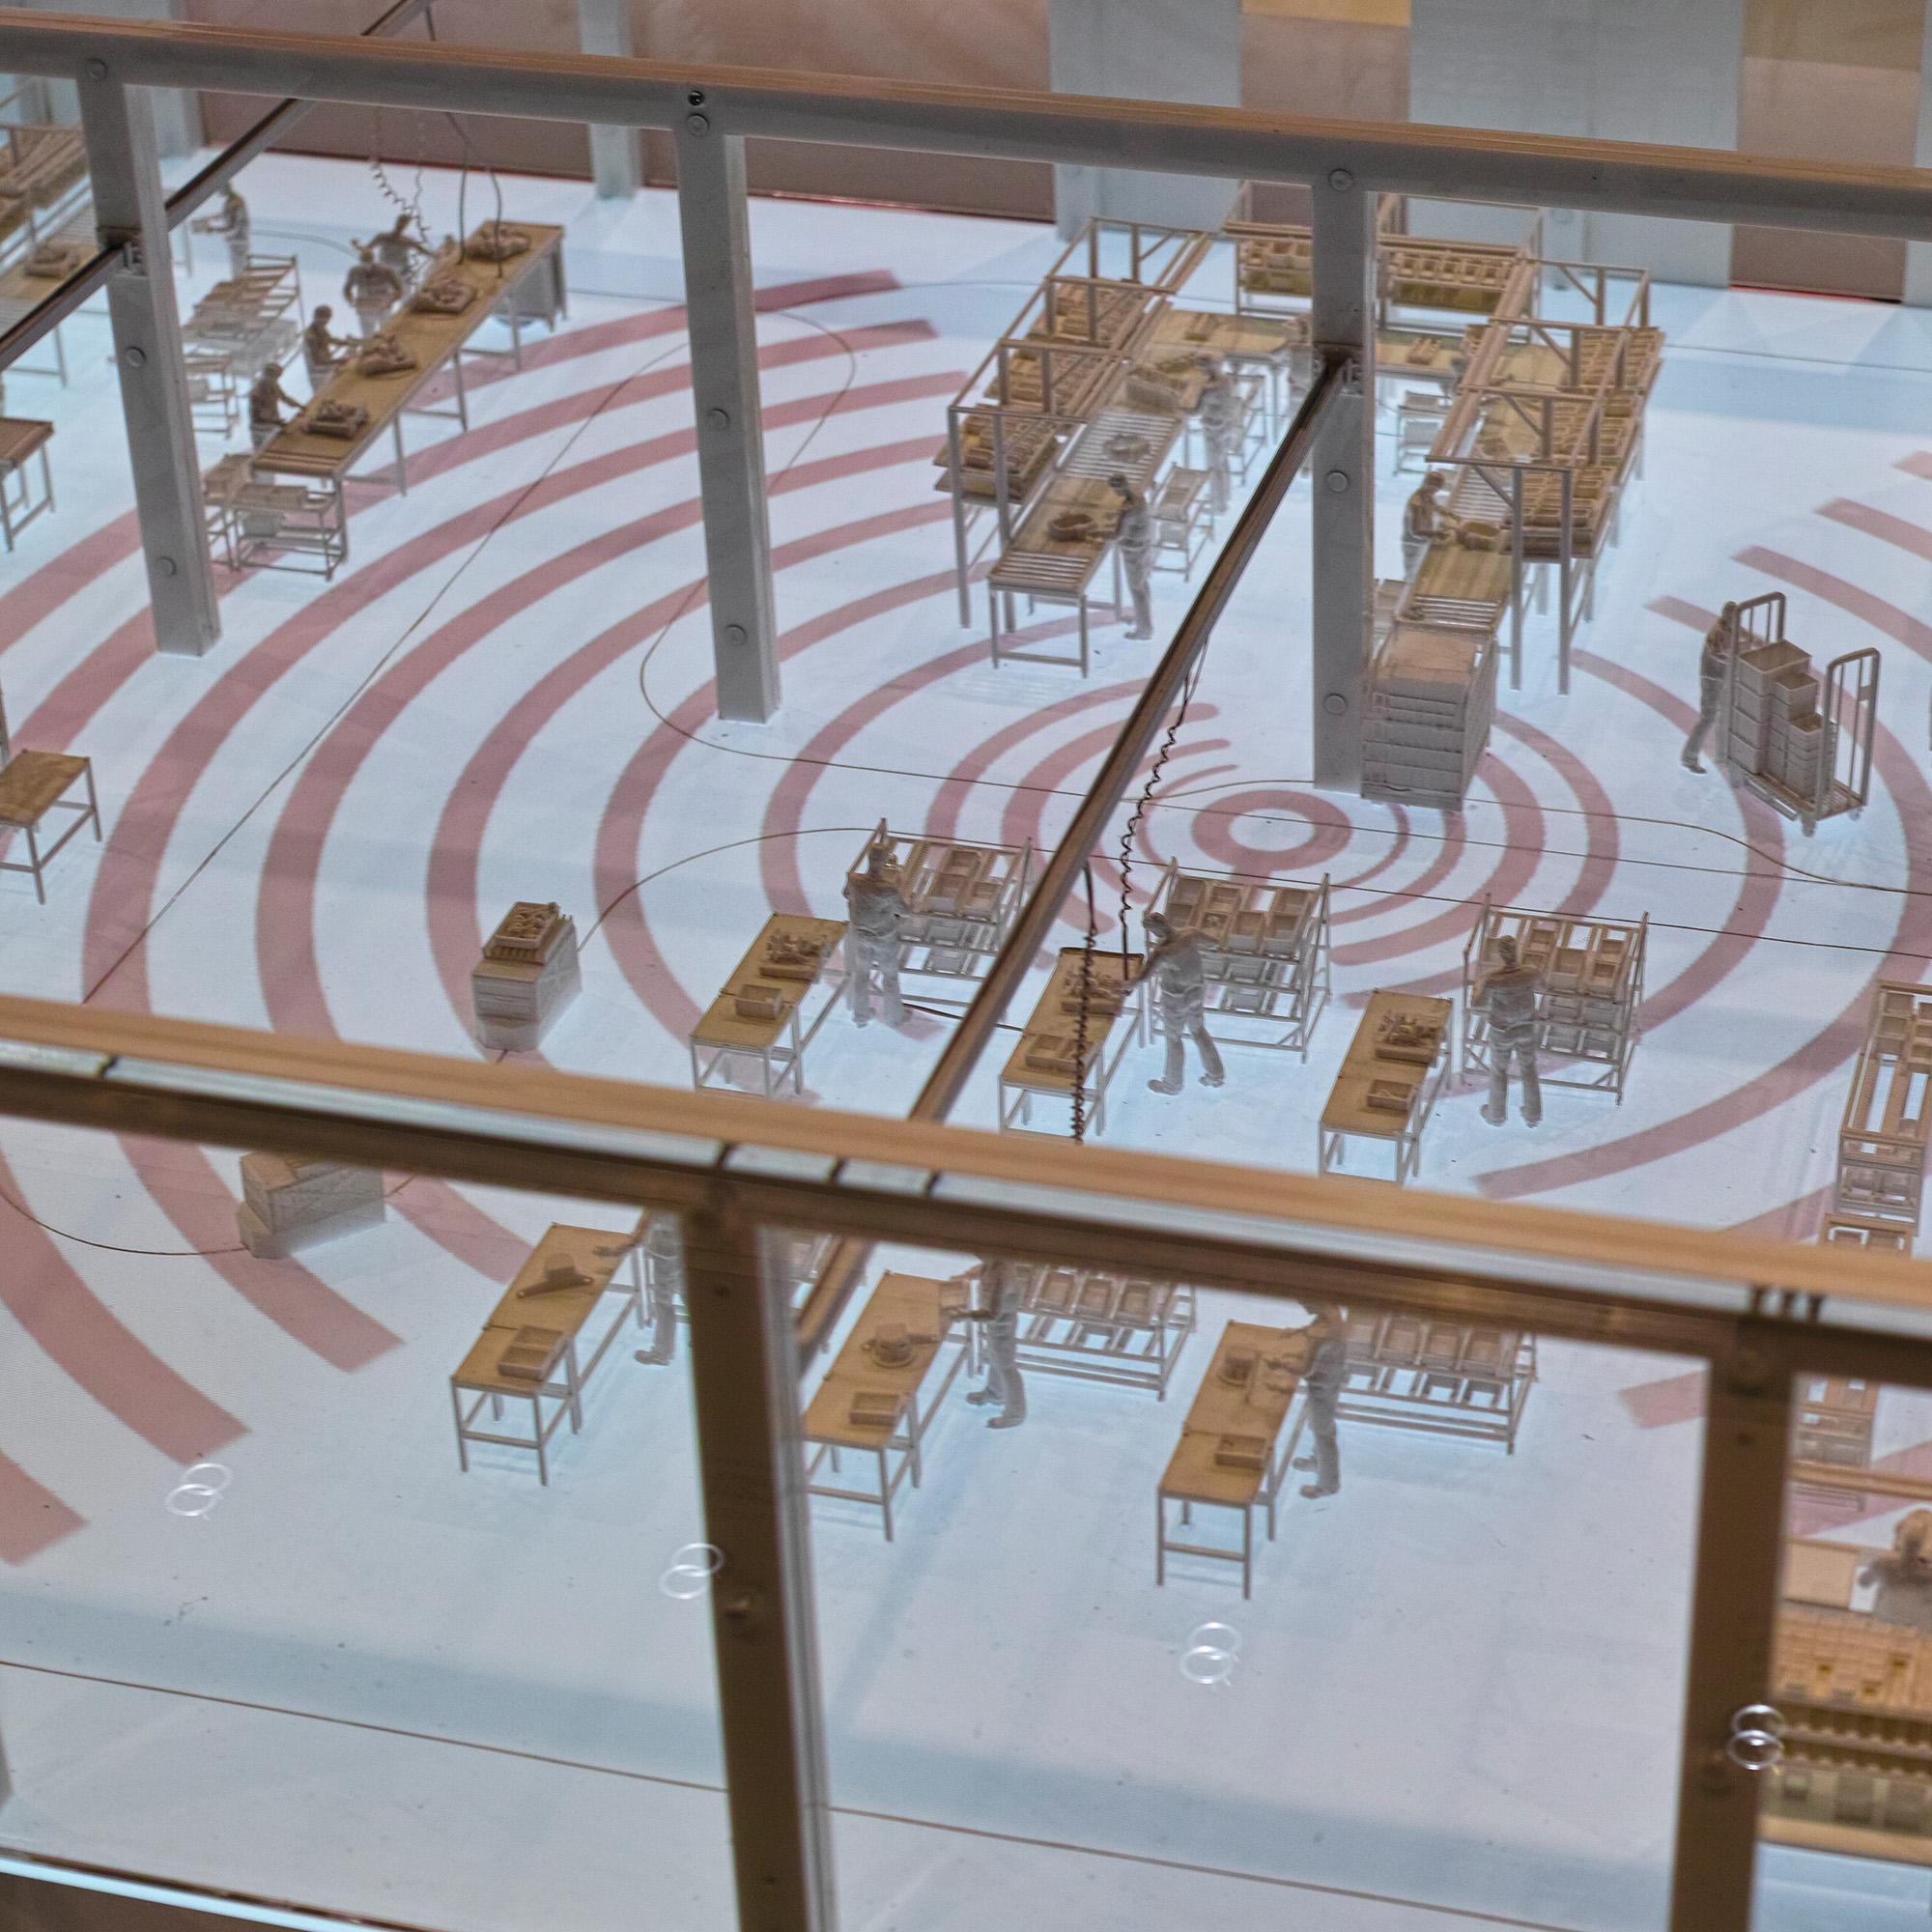 Logimat Exponat Werkshalle Unterflurprojektion